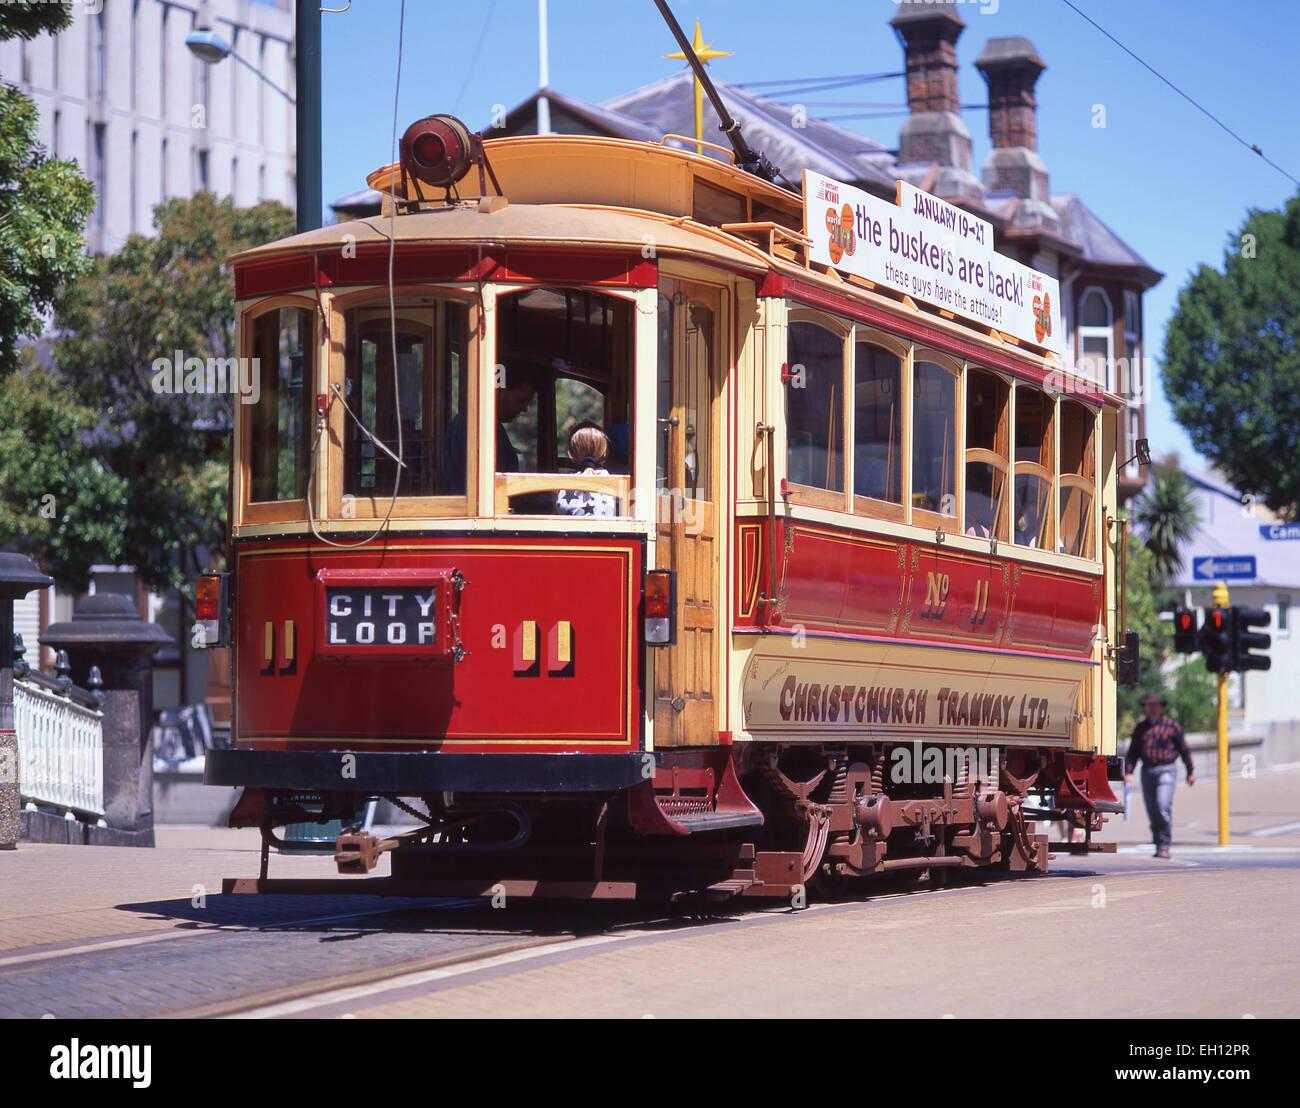 City Loop Straßenbahn, Region Worcester Boulevard, Christchurch, Canterbury, Südinsel, Neuseeland Stockbild